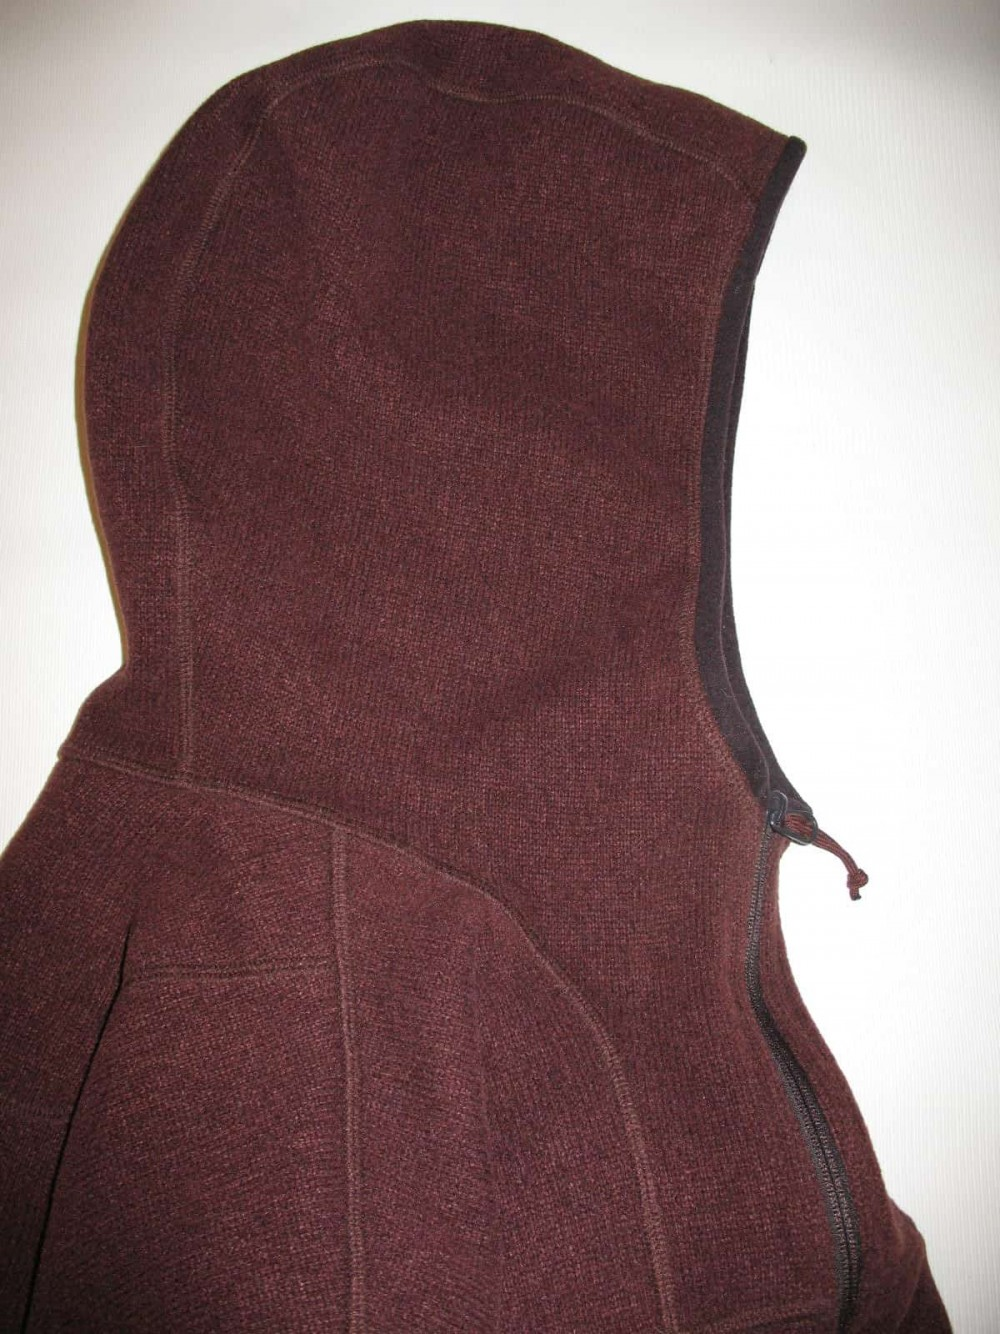 Кофта ARC'TERYX covert hoody (размер M) - 4